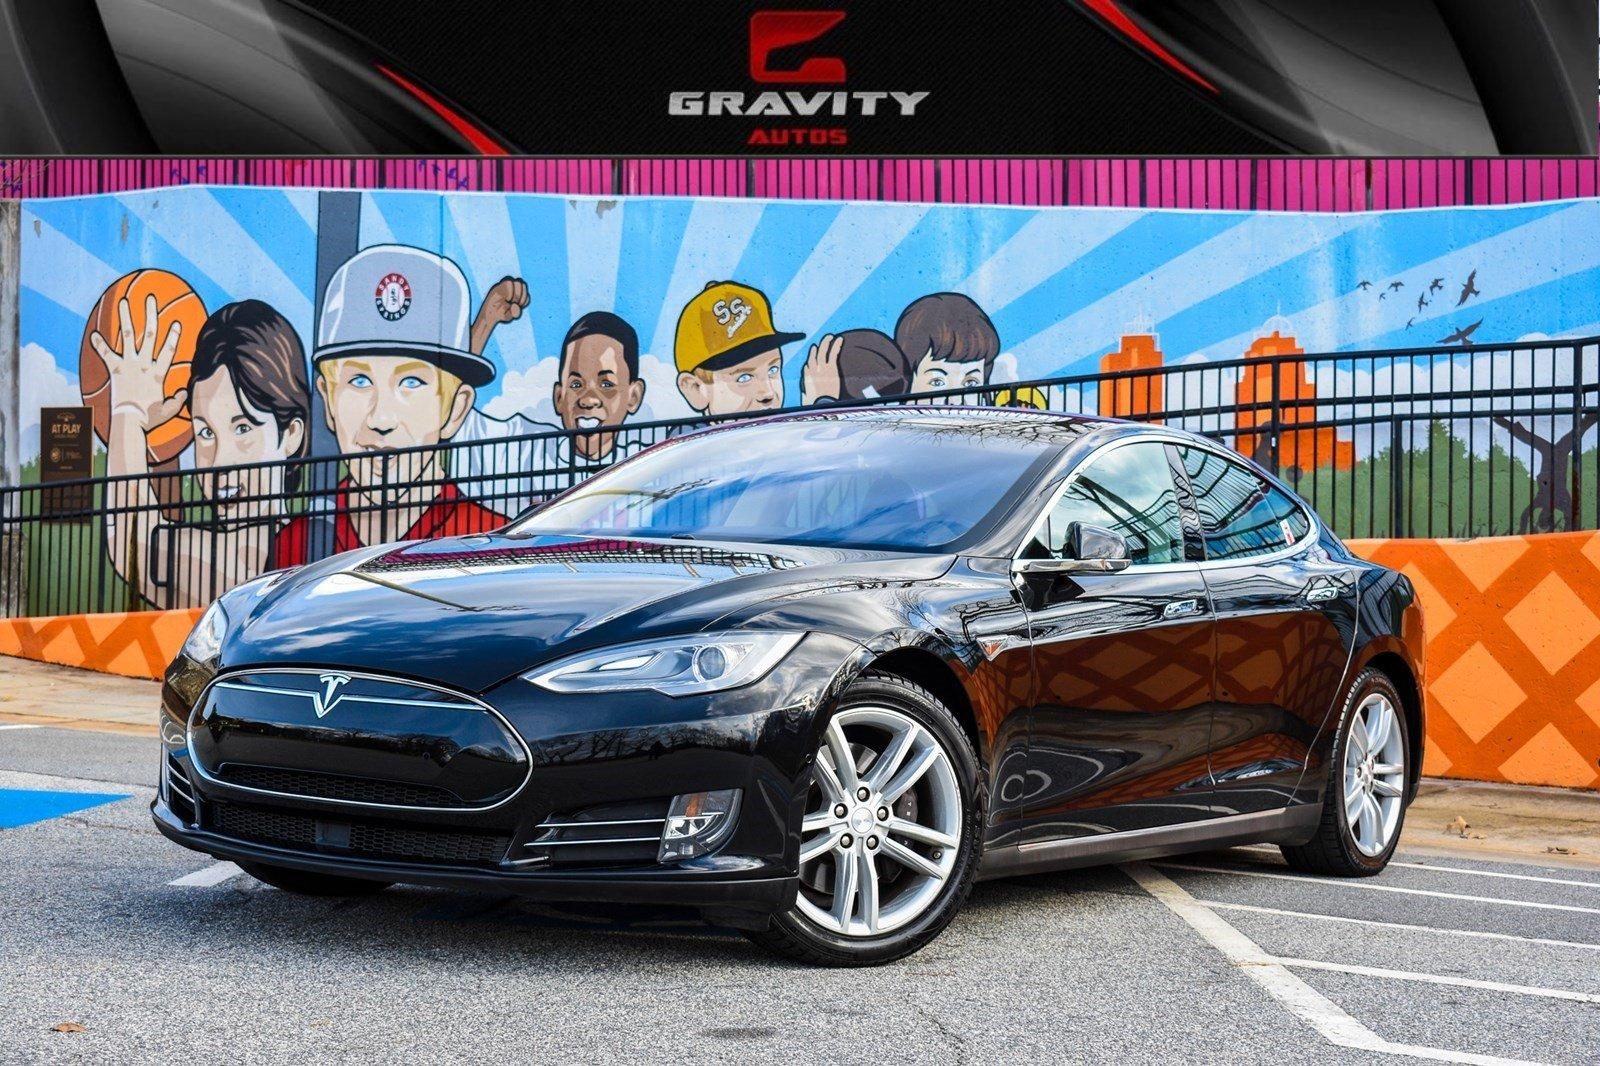 2014 Tesla Model S 60 kWh Battery Stock # P65522 for sale near Sandy